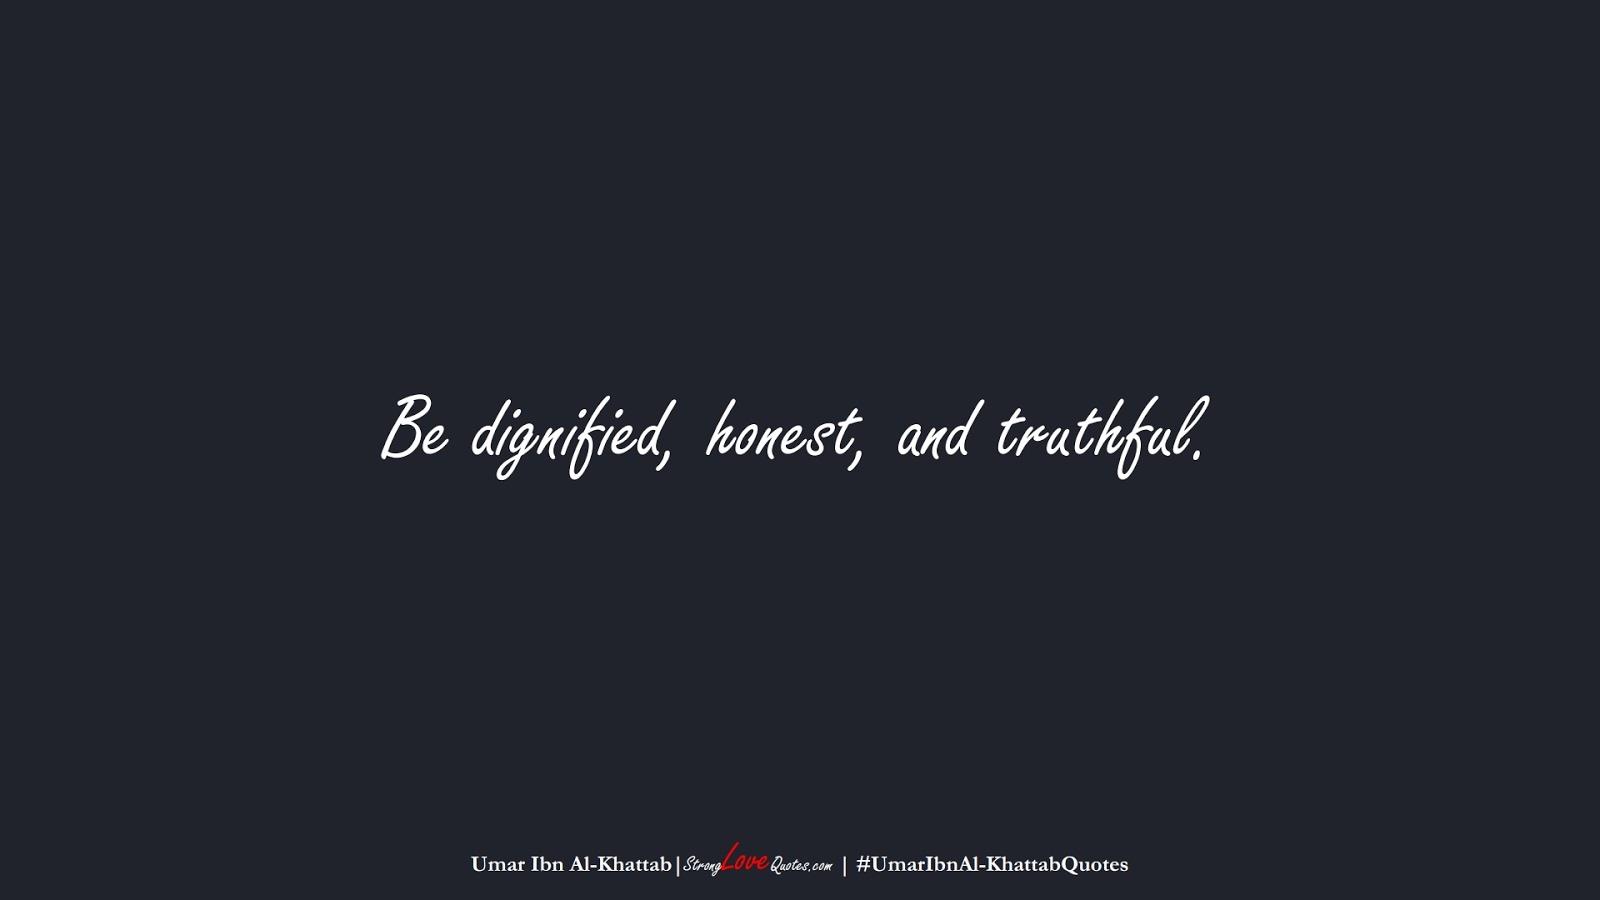 Be dignified, honest, and truthful. (Umar Ibn Al-Khattab);  #UmarIbnAl-KhattabQuotes